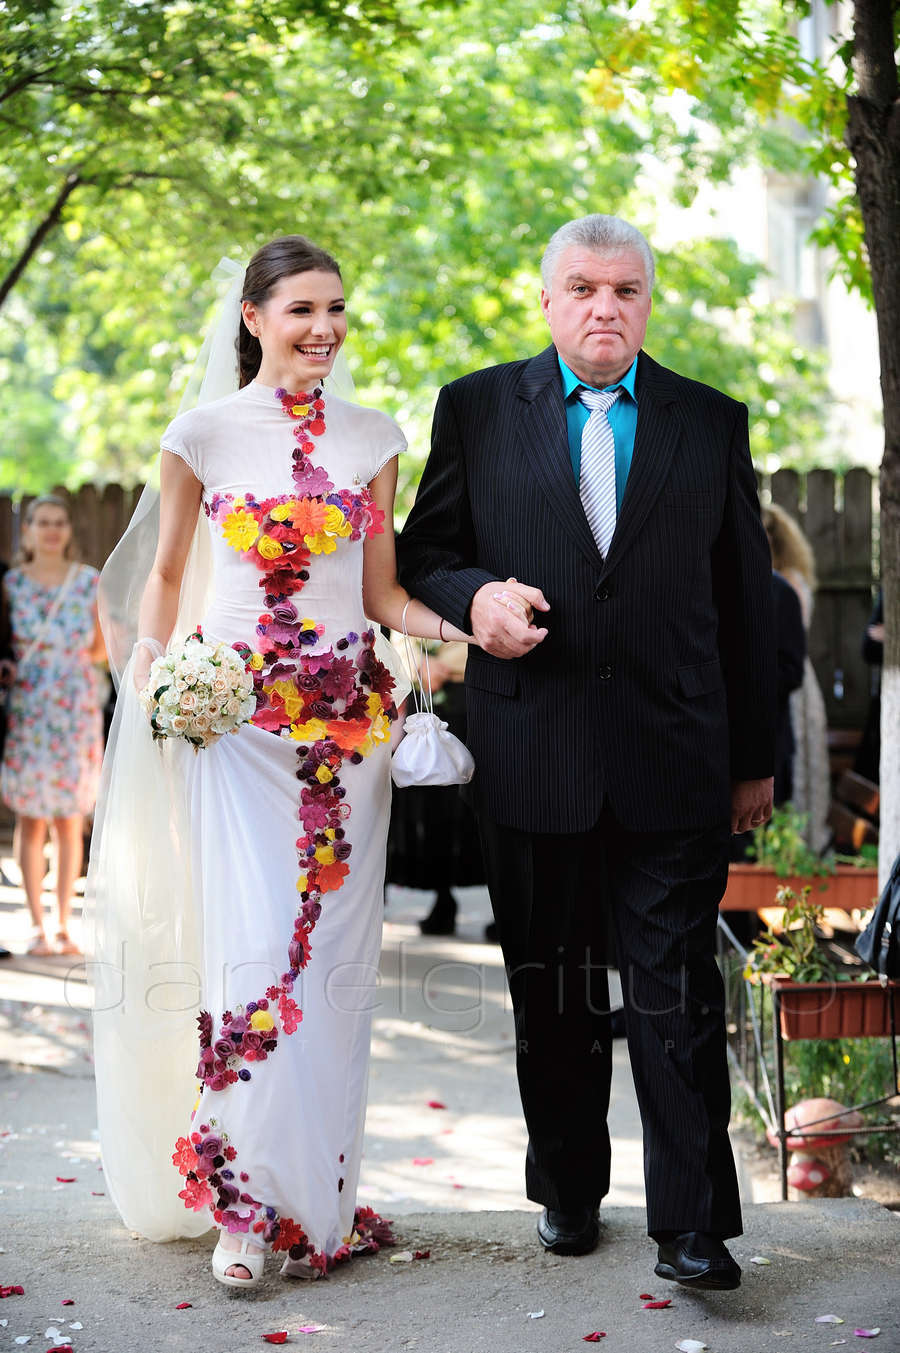 Nunta Ioana Picos si Mihai Fagadaru